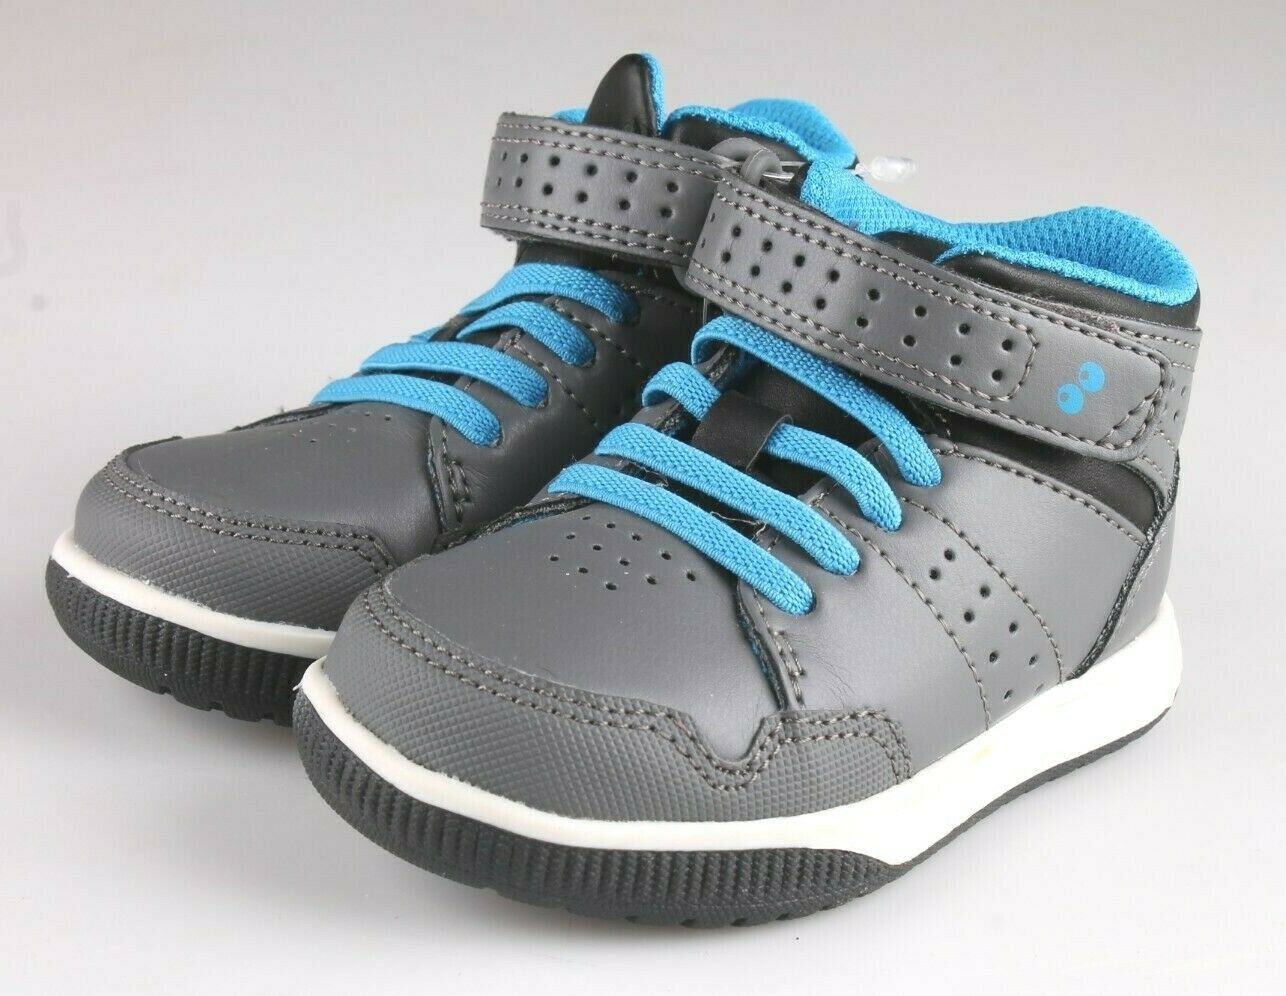 Surprize Von Stride Rite Memory Foam Grau Blau Damarian Hi Top Sneaker Shoes Nwt